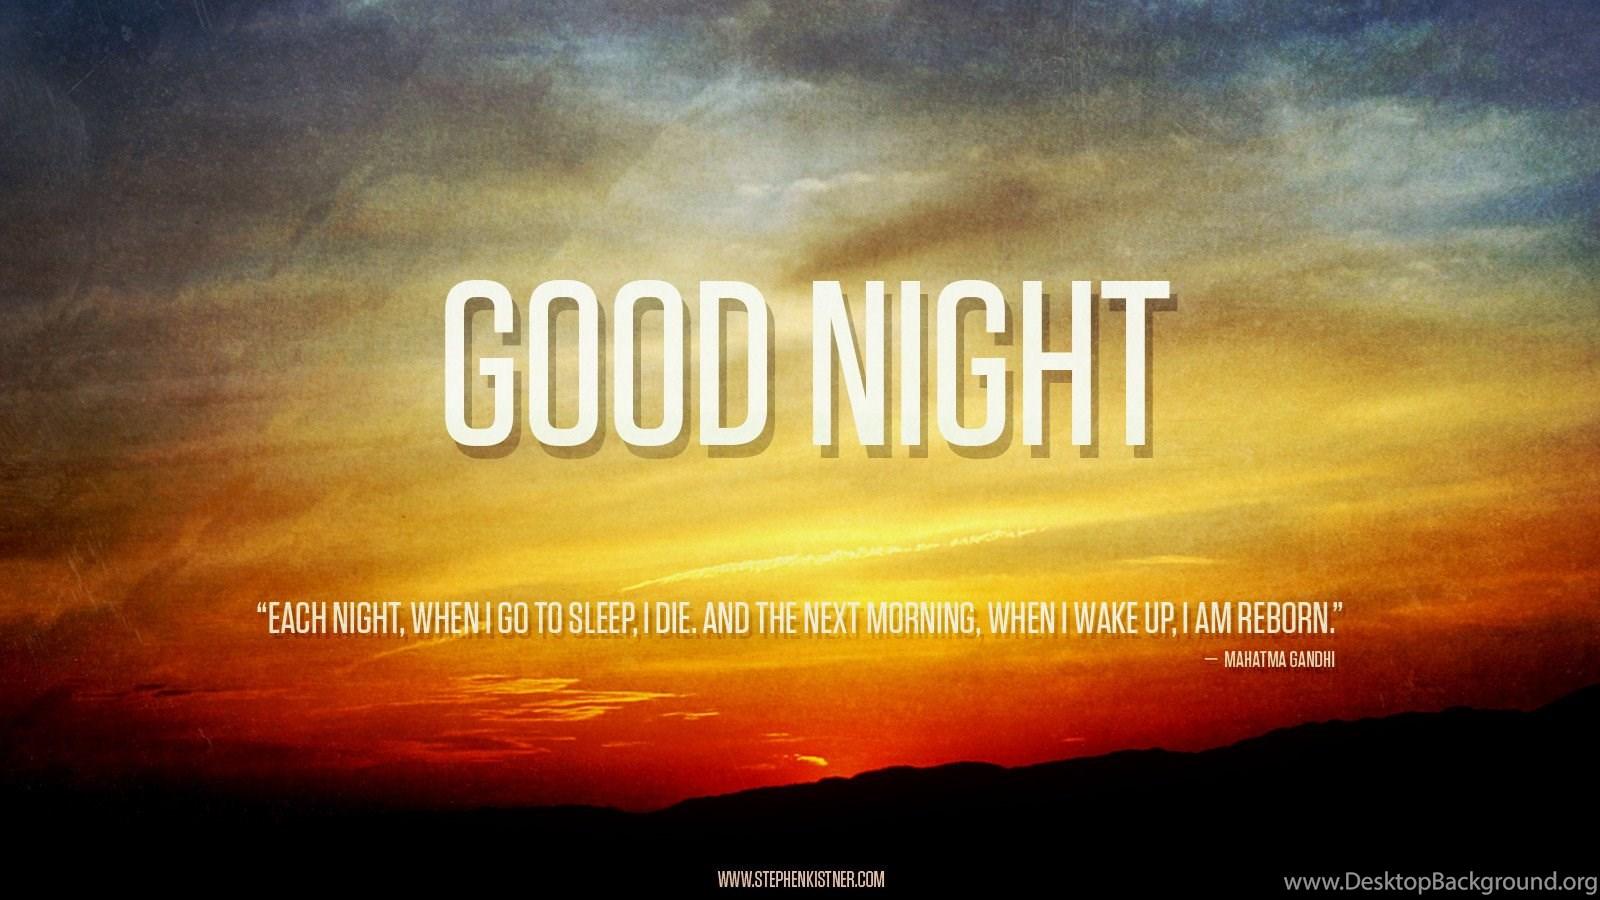 Free good night wallpapers desktop background popular voltagebd Images